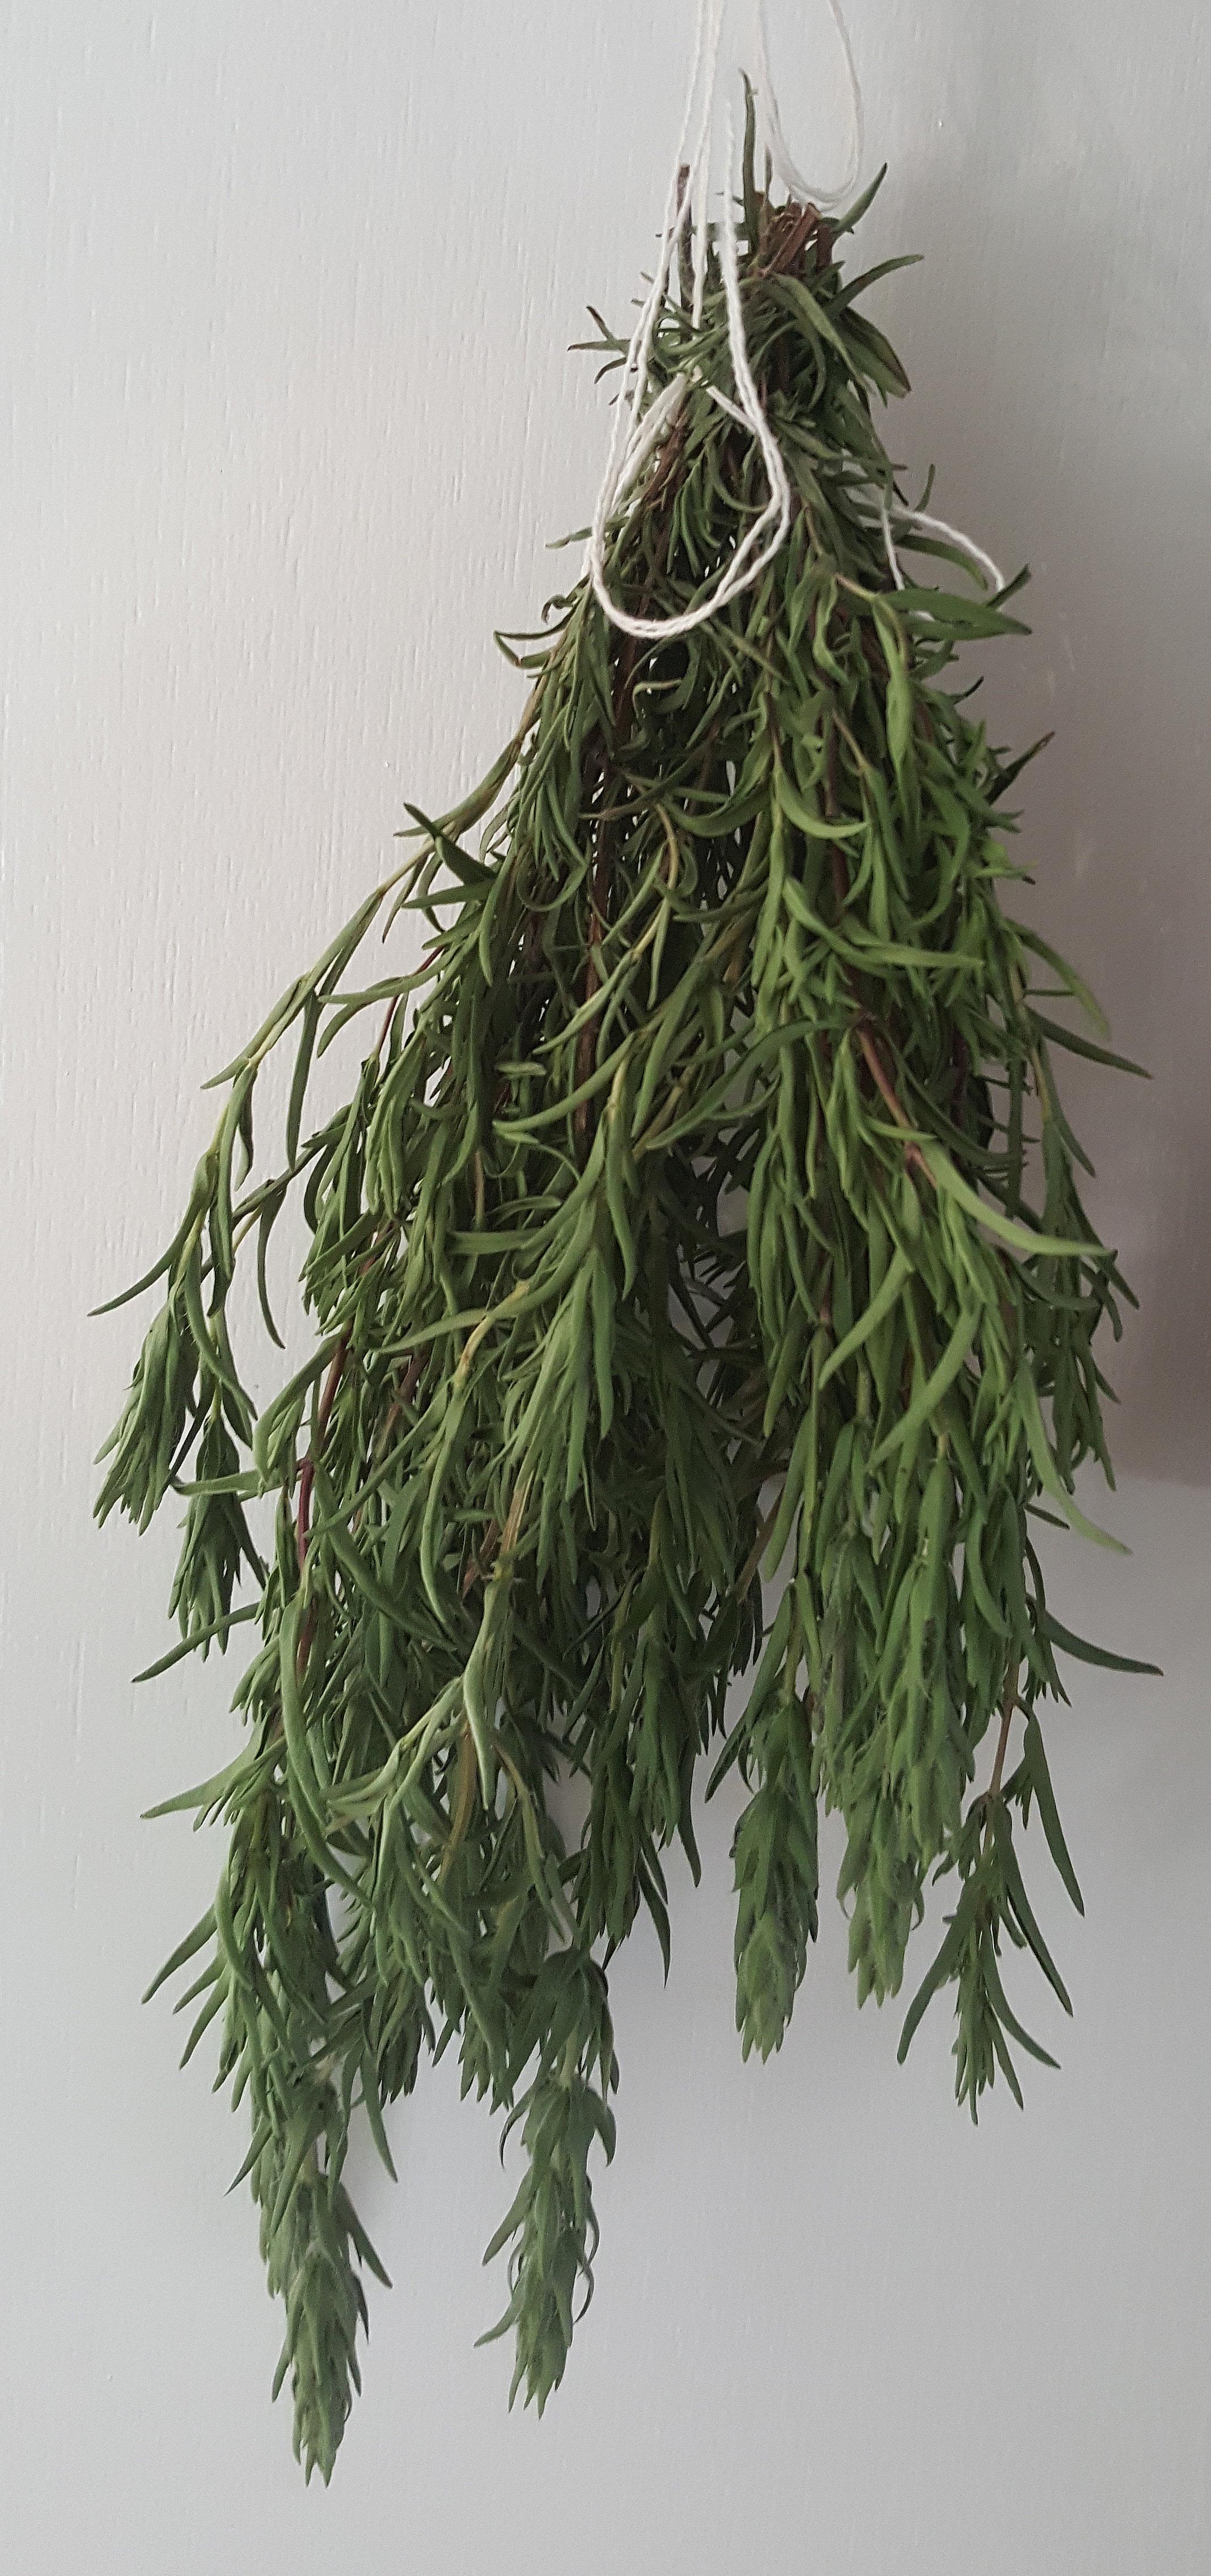 zaatar-drying